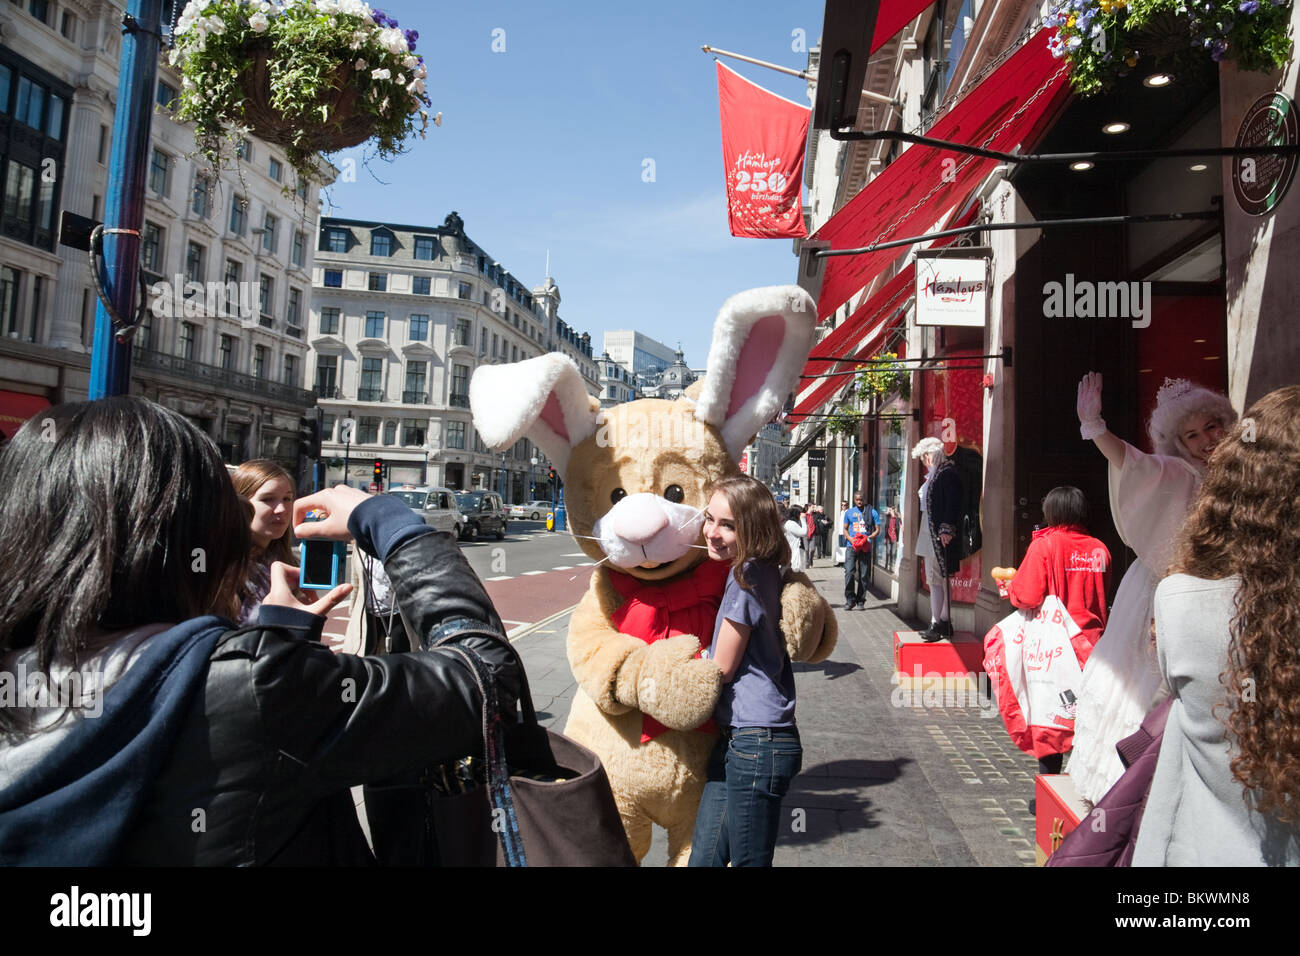 250th anniversary of Hamleys toystore, Regent Street, London UK - Stock Image